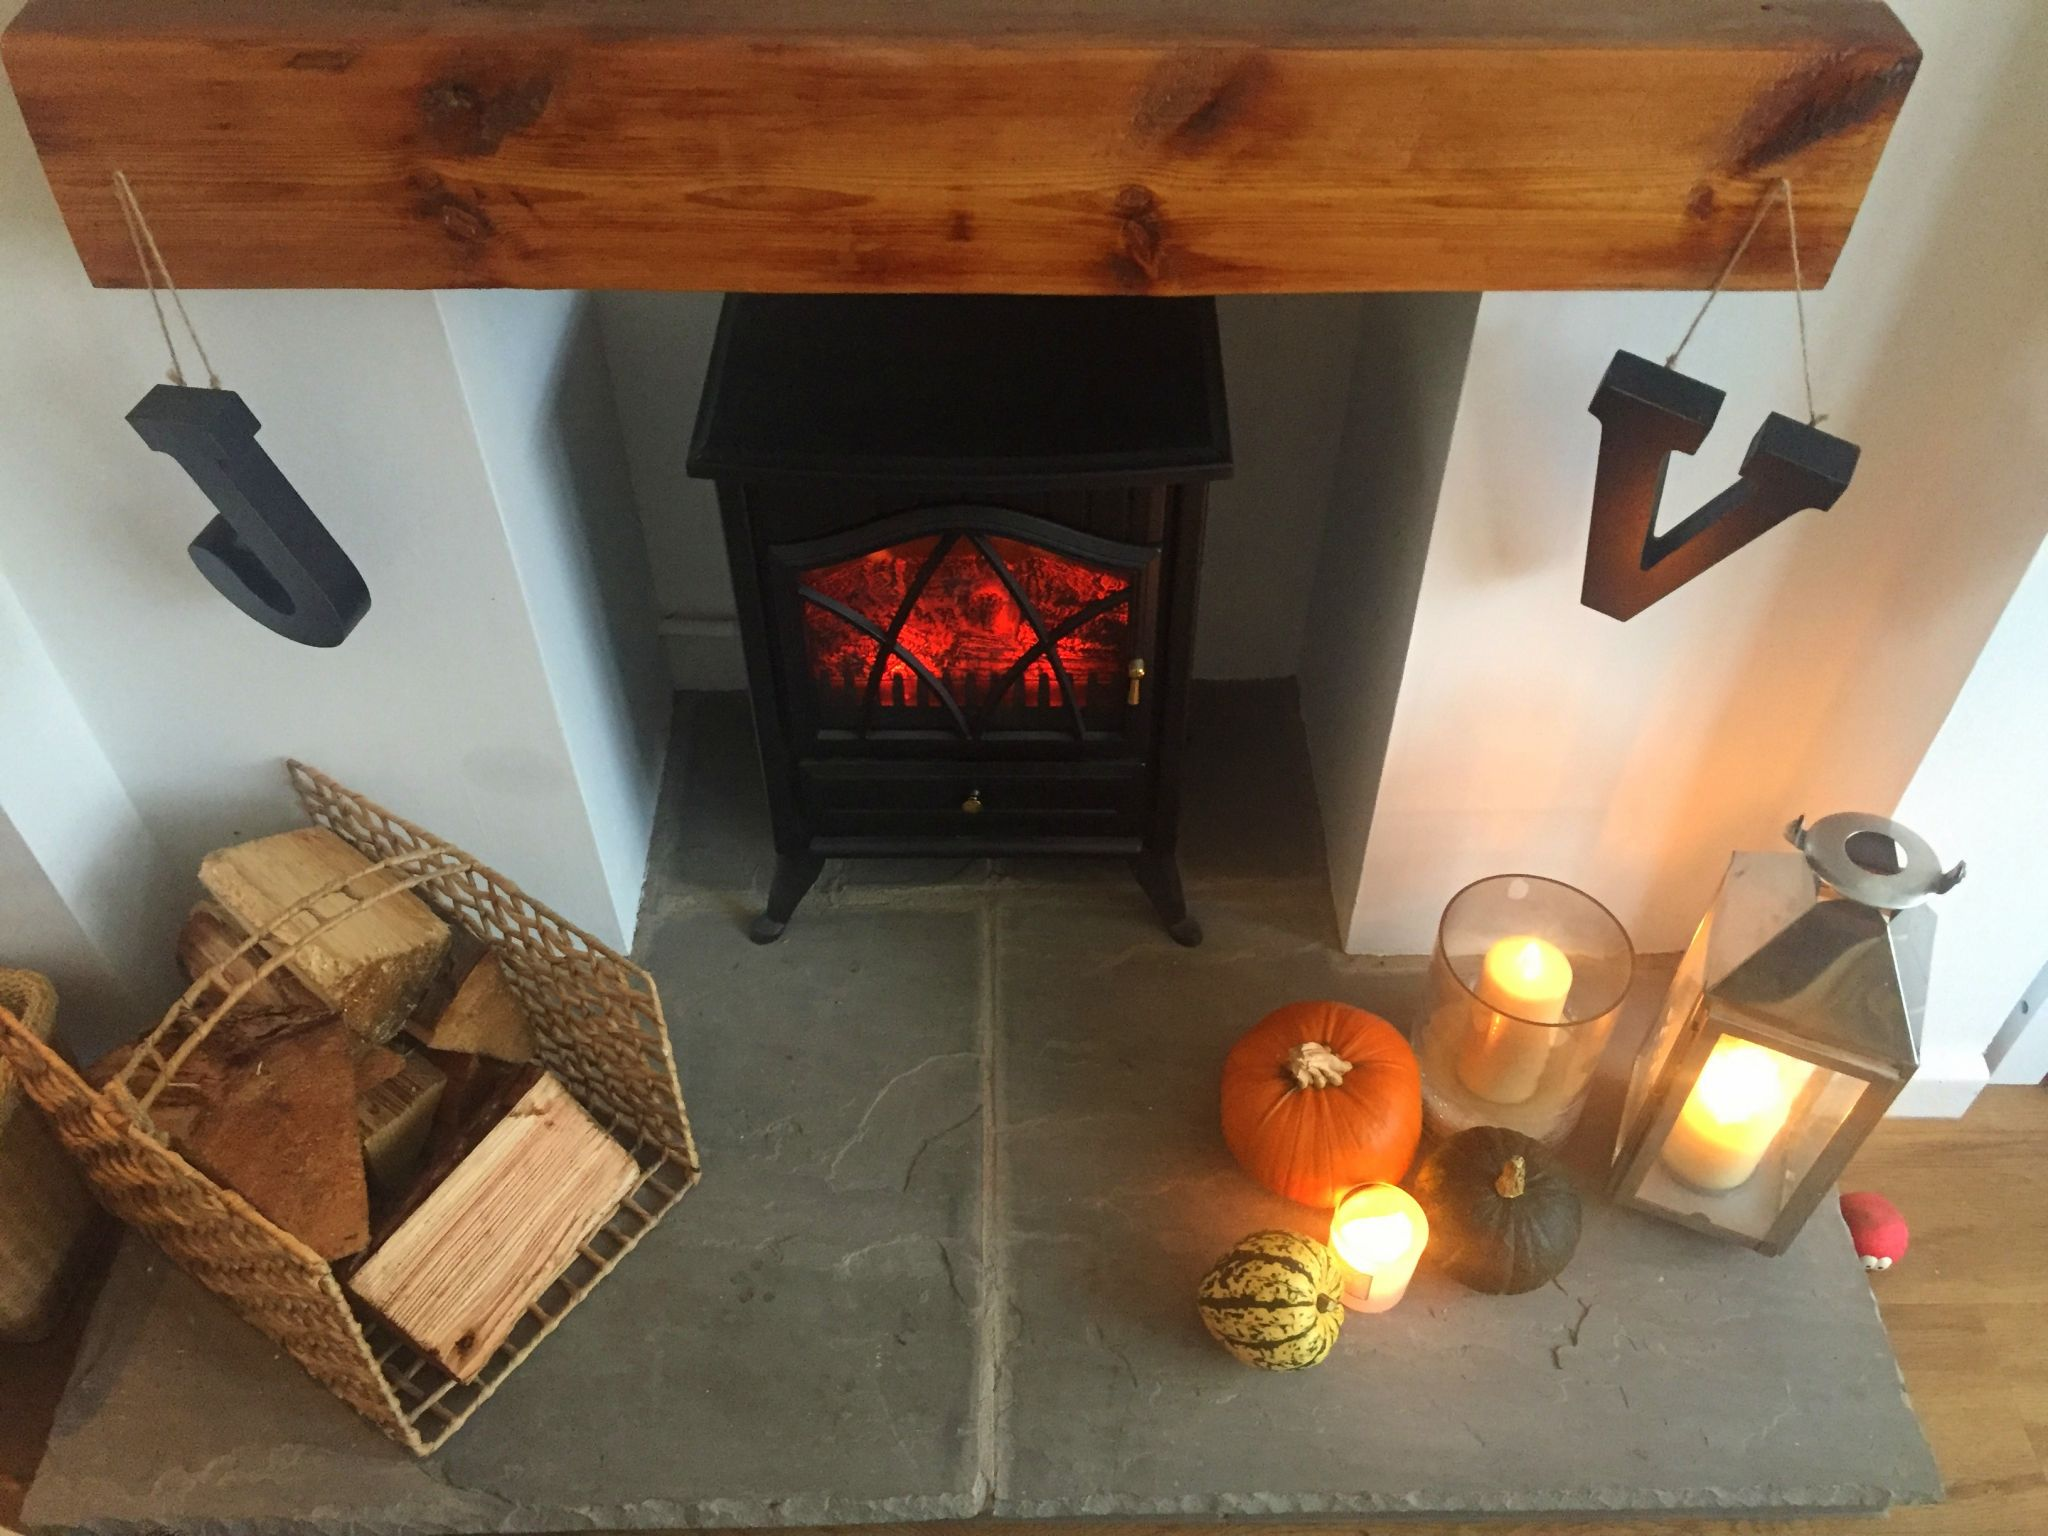 Fire, Violet Glenton, Home, Interior